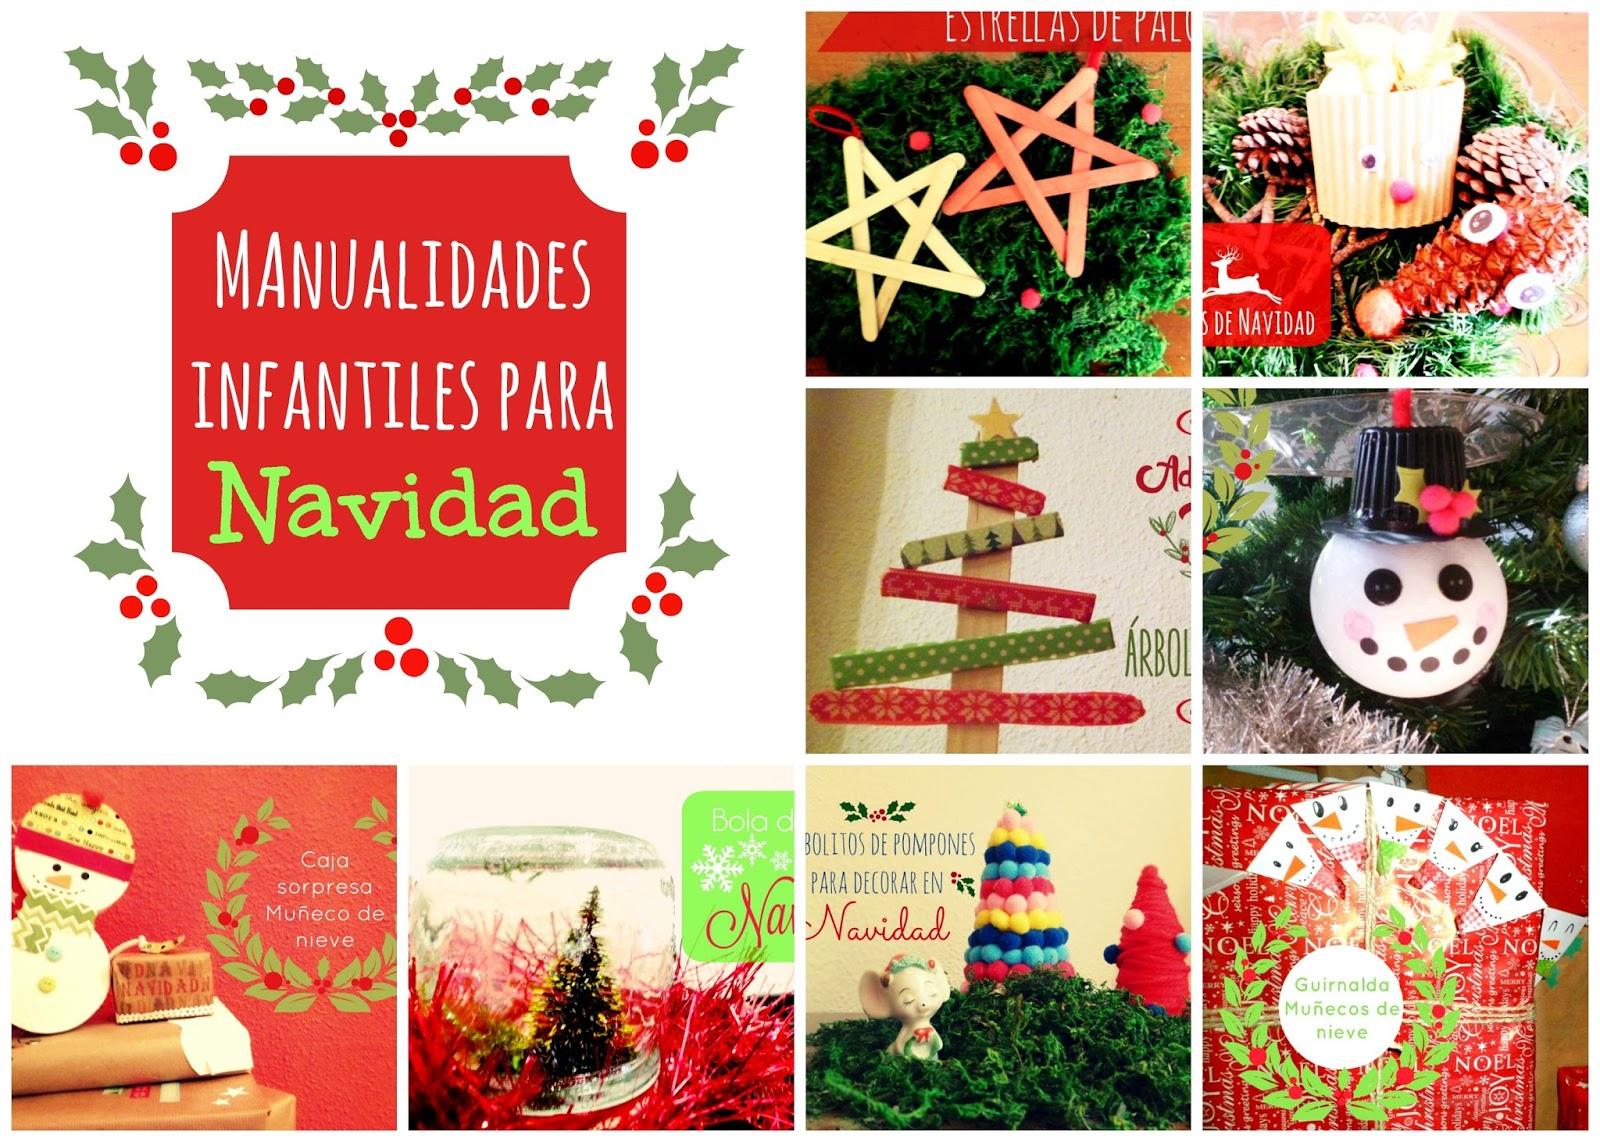 Lluvia de ideas materiales diy manualidades infantiles for Ideas manualidades navidad